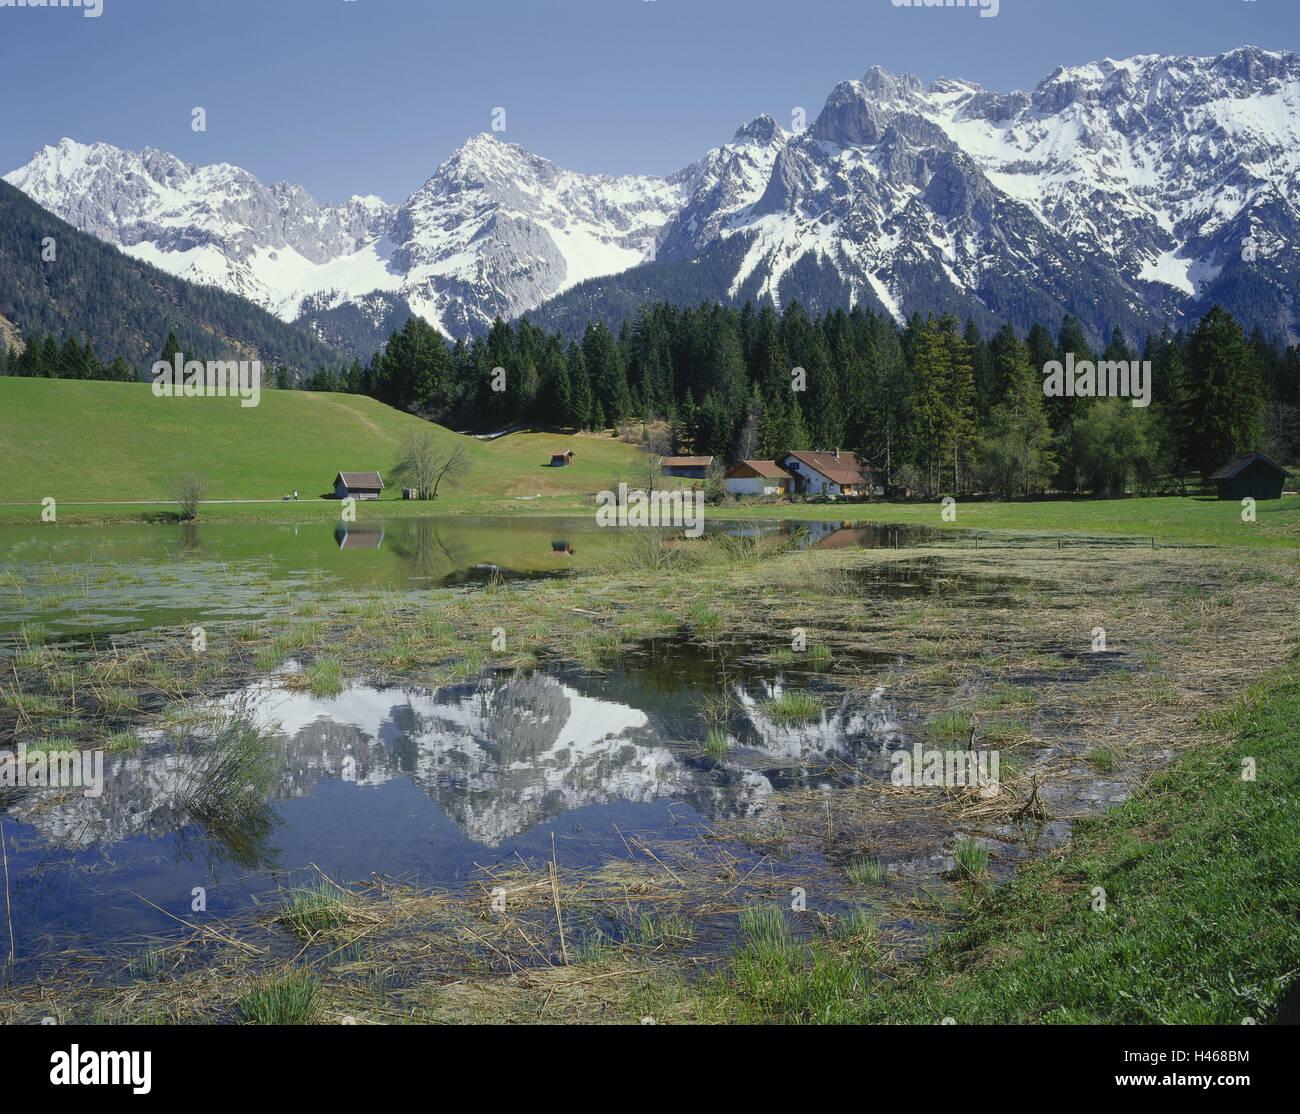 Germany, Bavaria, Werdenfels (region), Schmalensee, Looking Karwendel, reflection, water surface, Europe, Upper - Stock Image